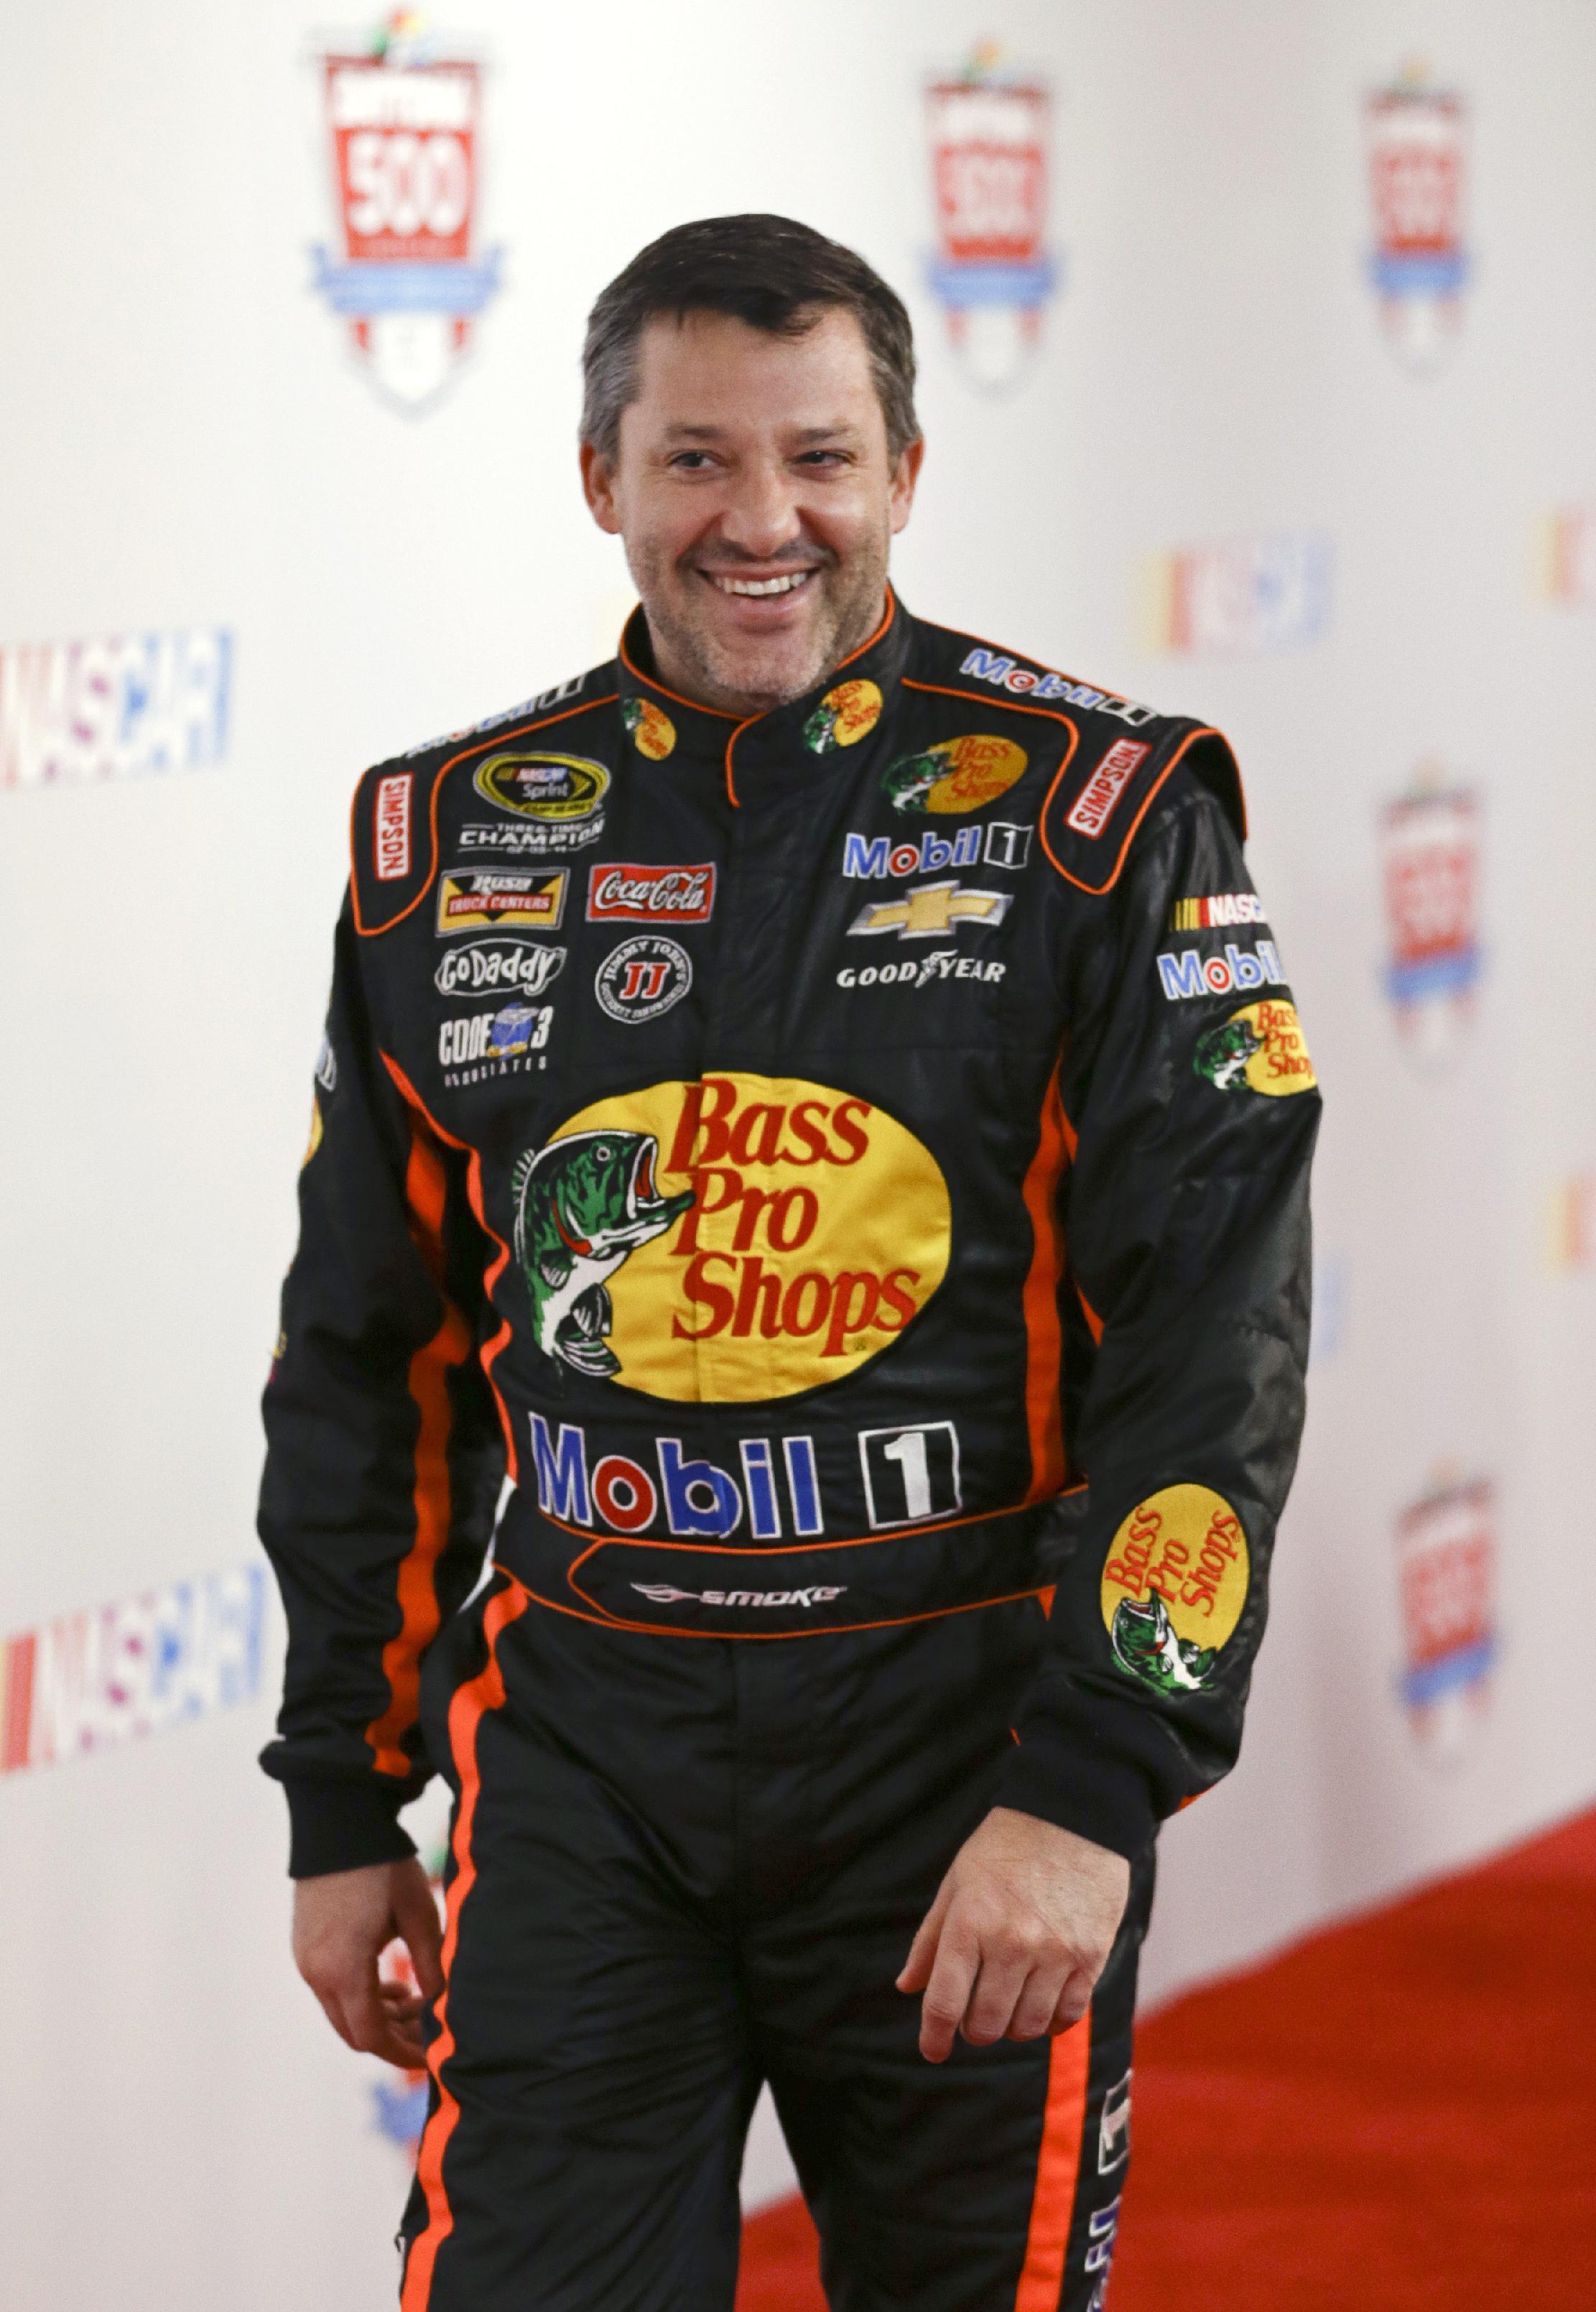 Stewart returns to racing, undaunted by layoff